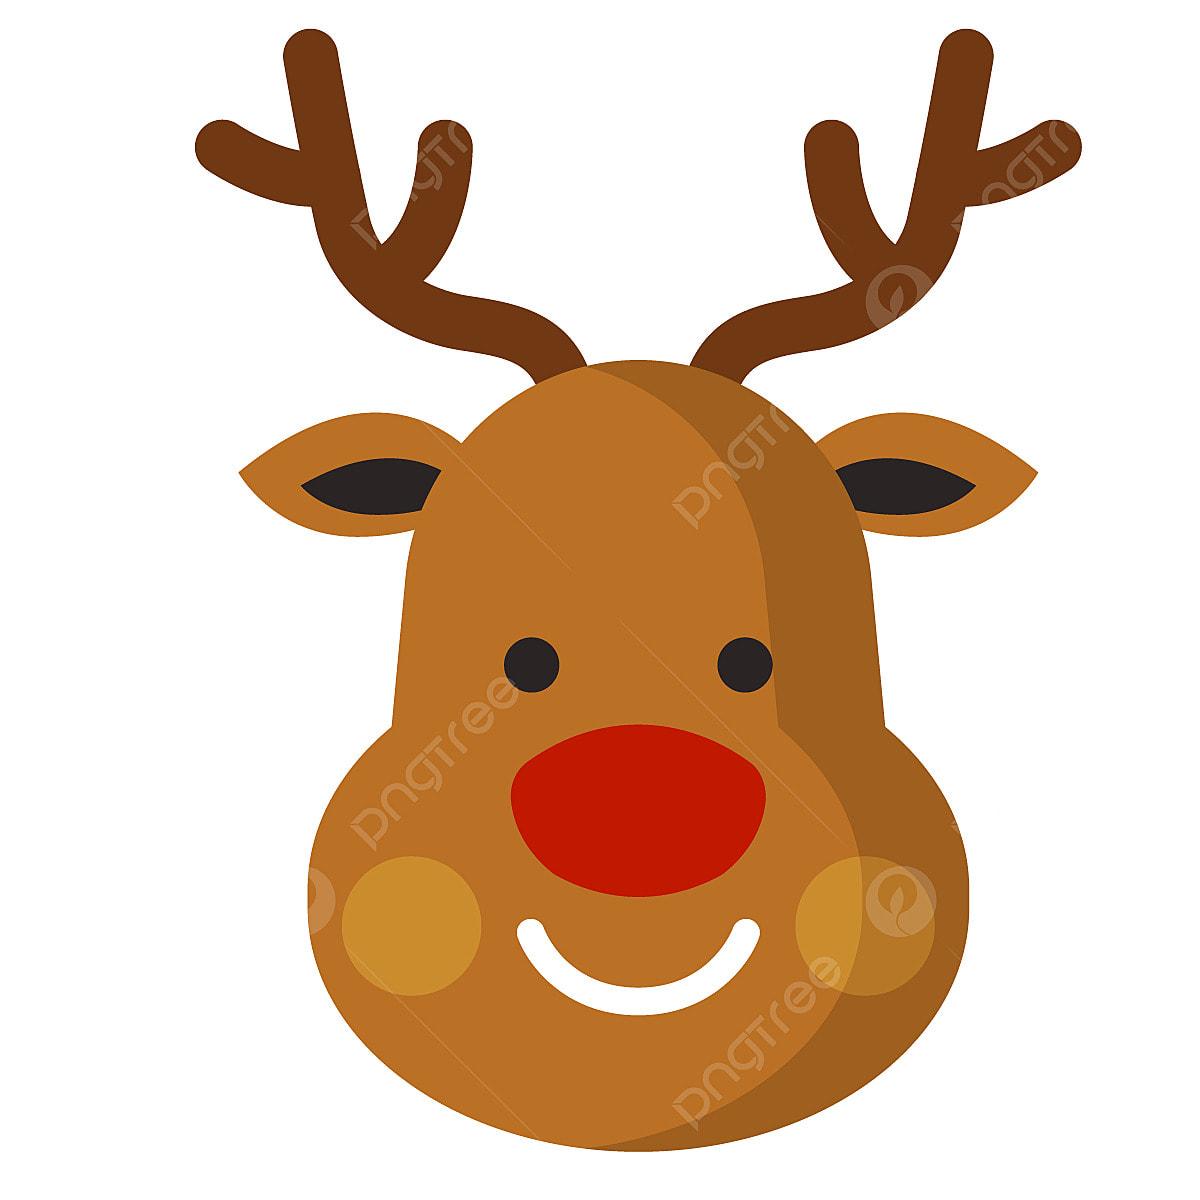 Christmas Reindeer clipart. Free download transparent .PNG   Creazilla